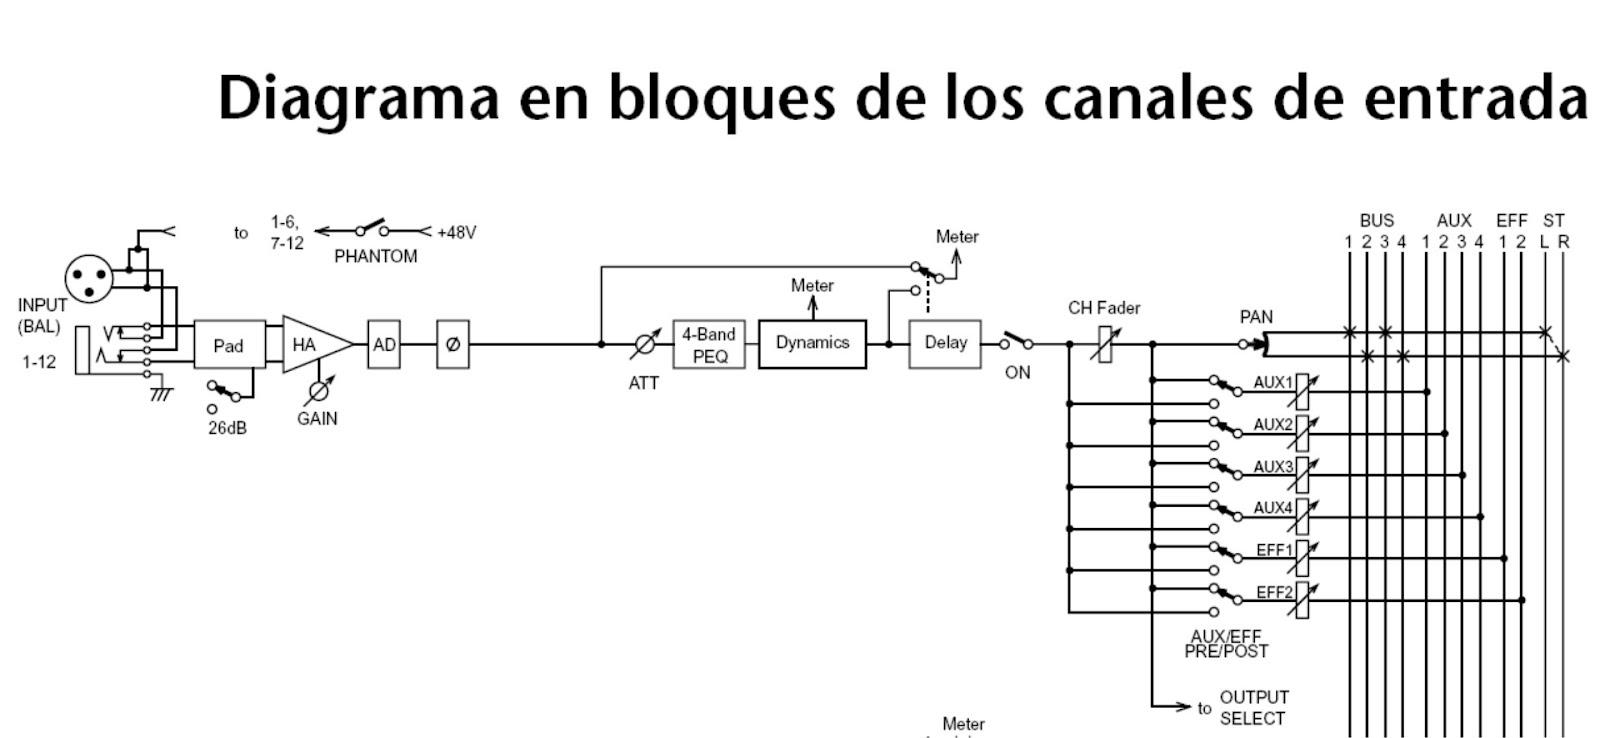 Fabulous Diagram Usb Plug Wiring Diagram Usb To 3 5Mm Jack Wiring Diagram Wiring Cloud Hemtshollocom